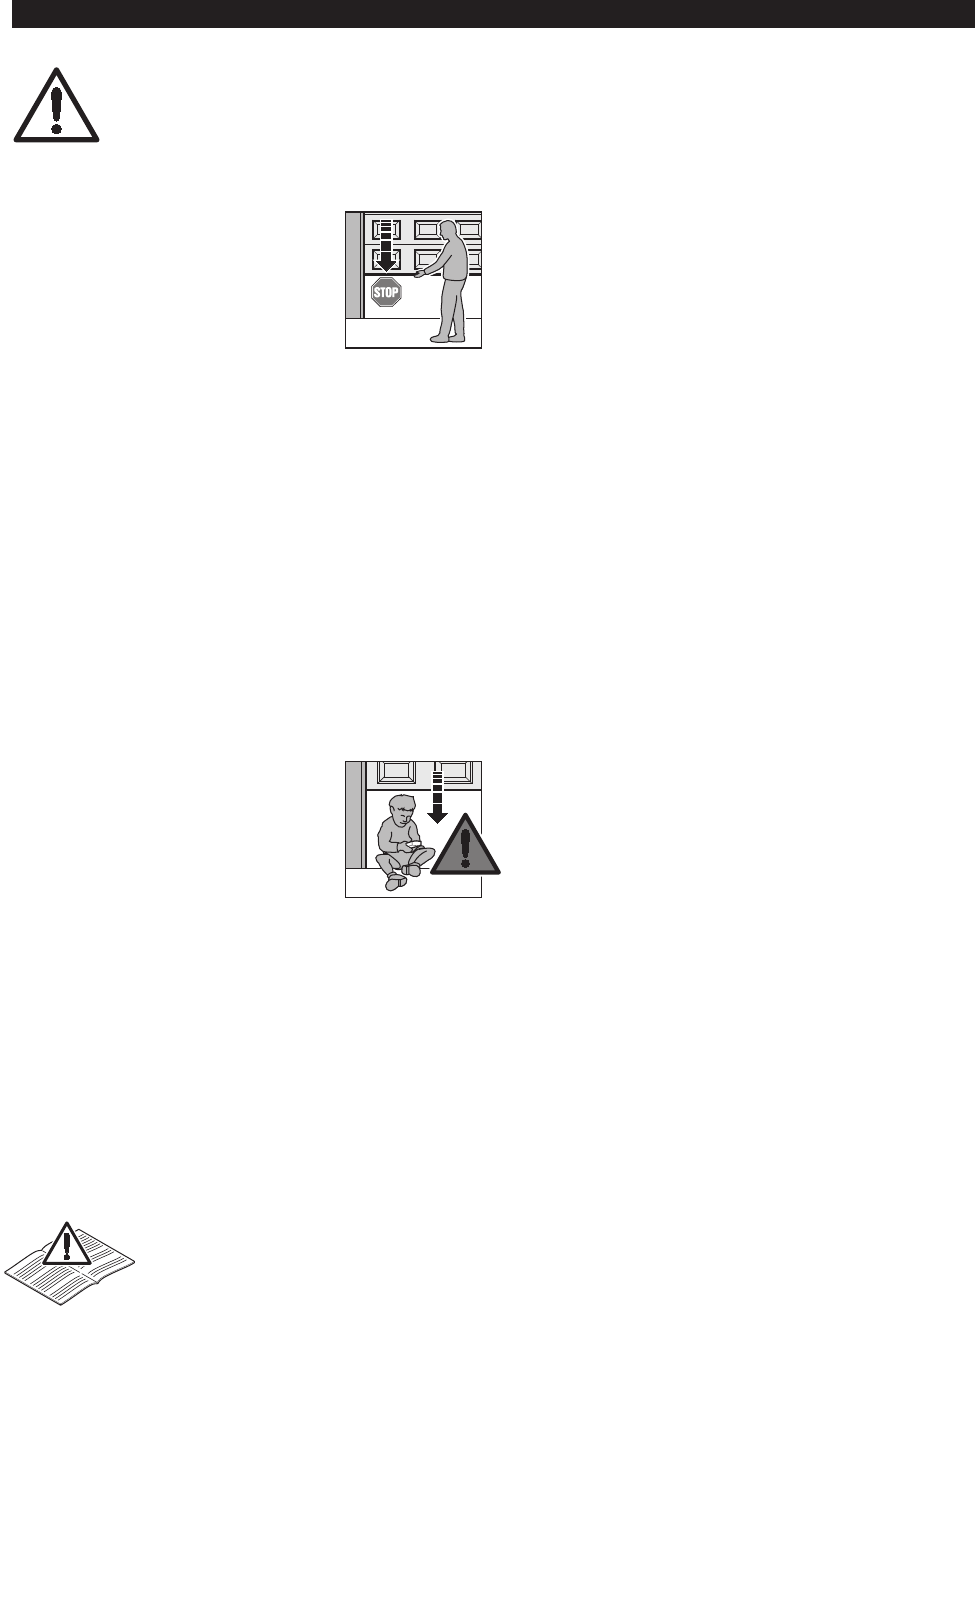 Porte De Garage Hormann Pas Cher handleiding hormann ecostar (pagina 3 van 117) (alle talen)